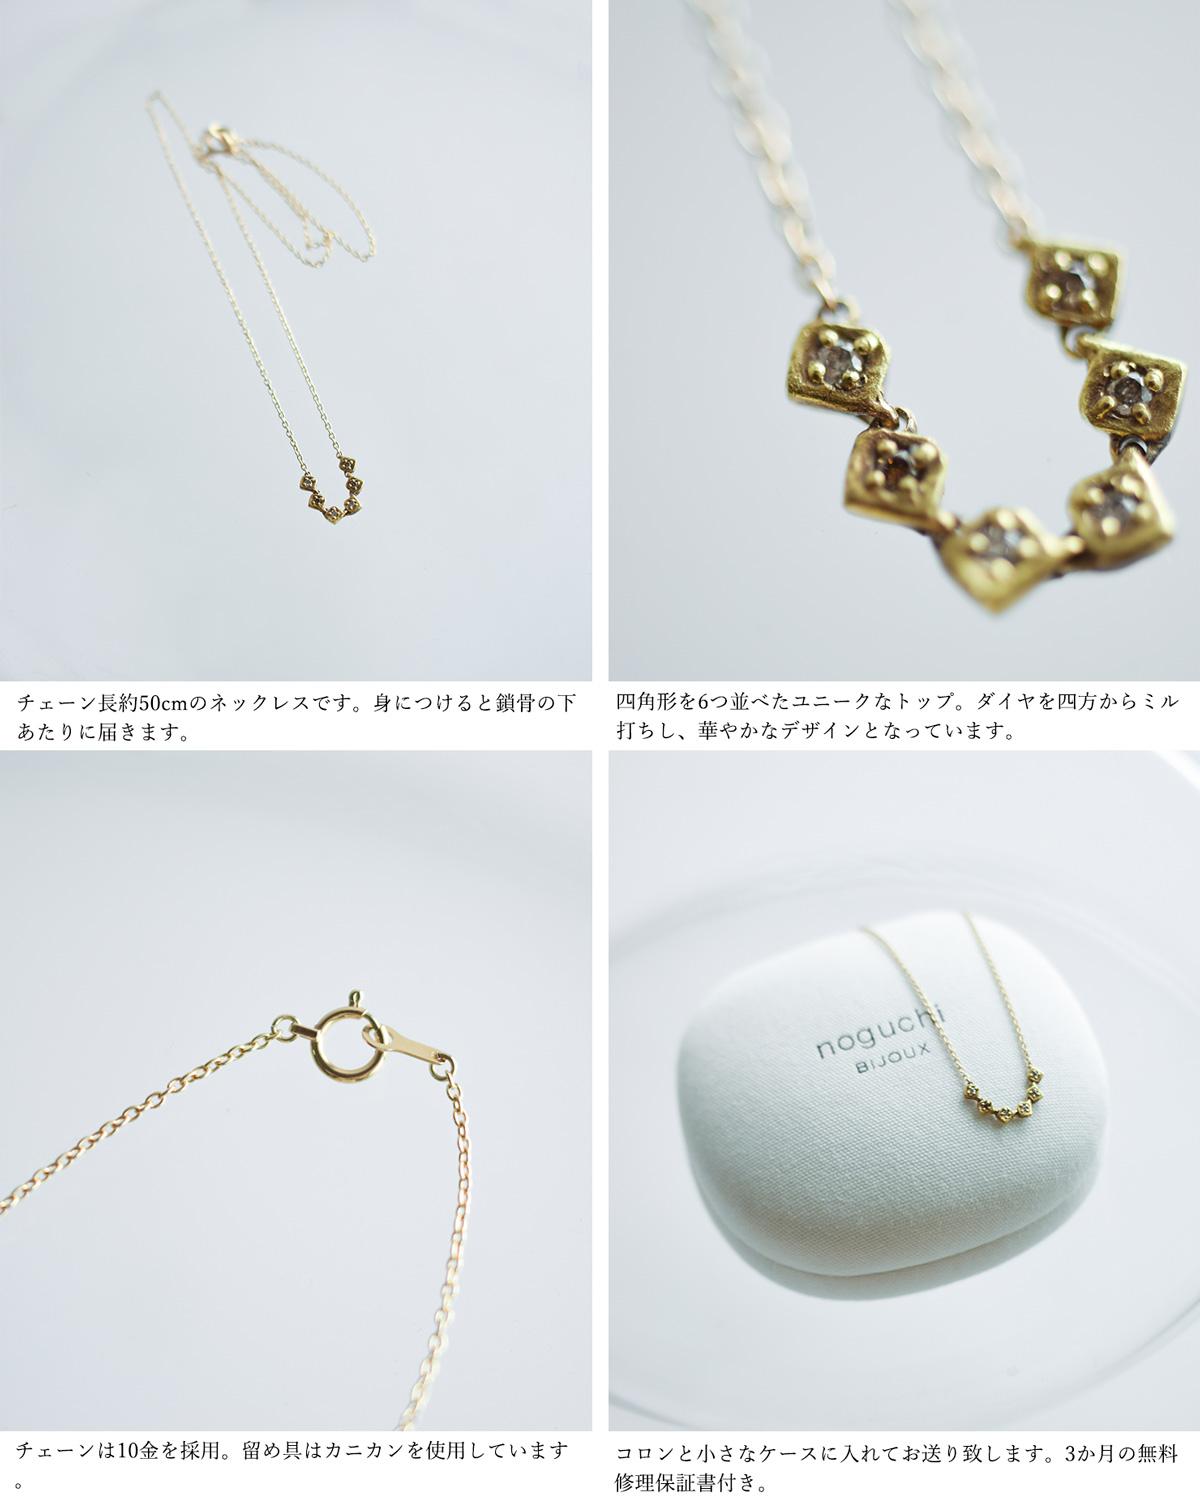 noguchi BIJOUX(ノグチ)K14ダイヤネックレス nn4013